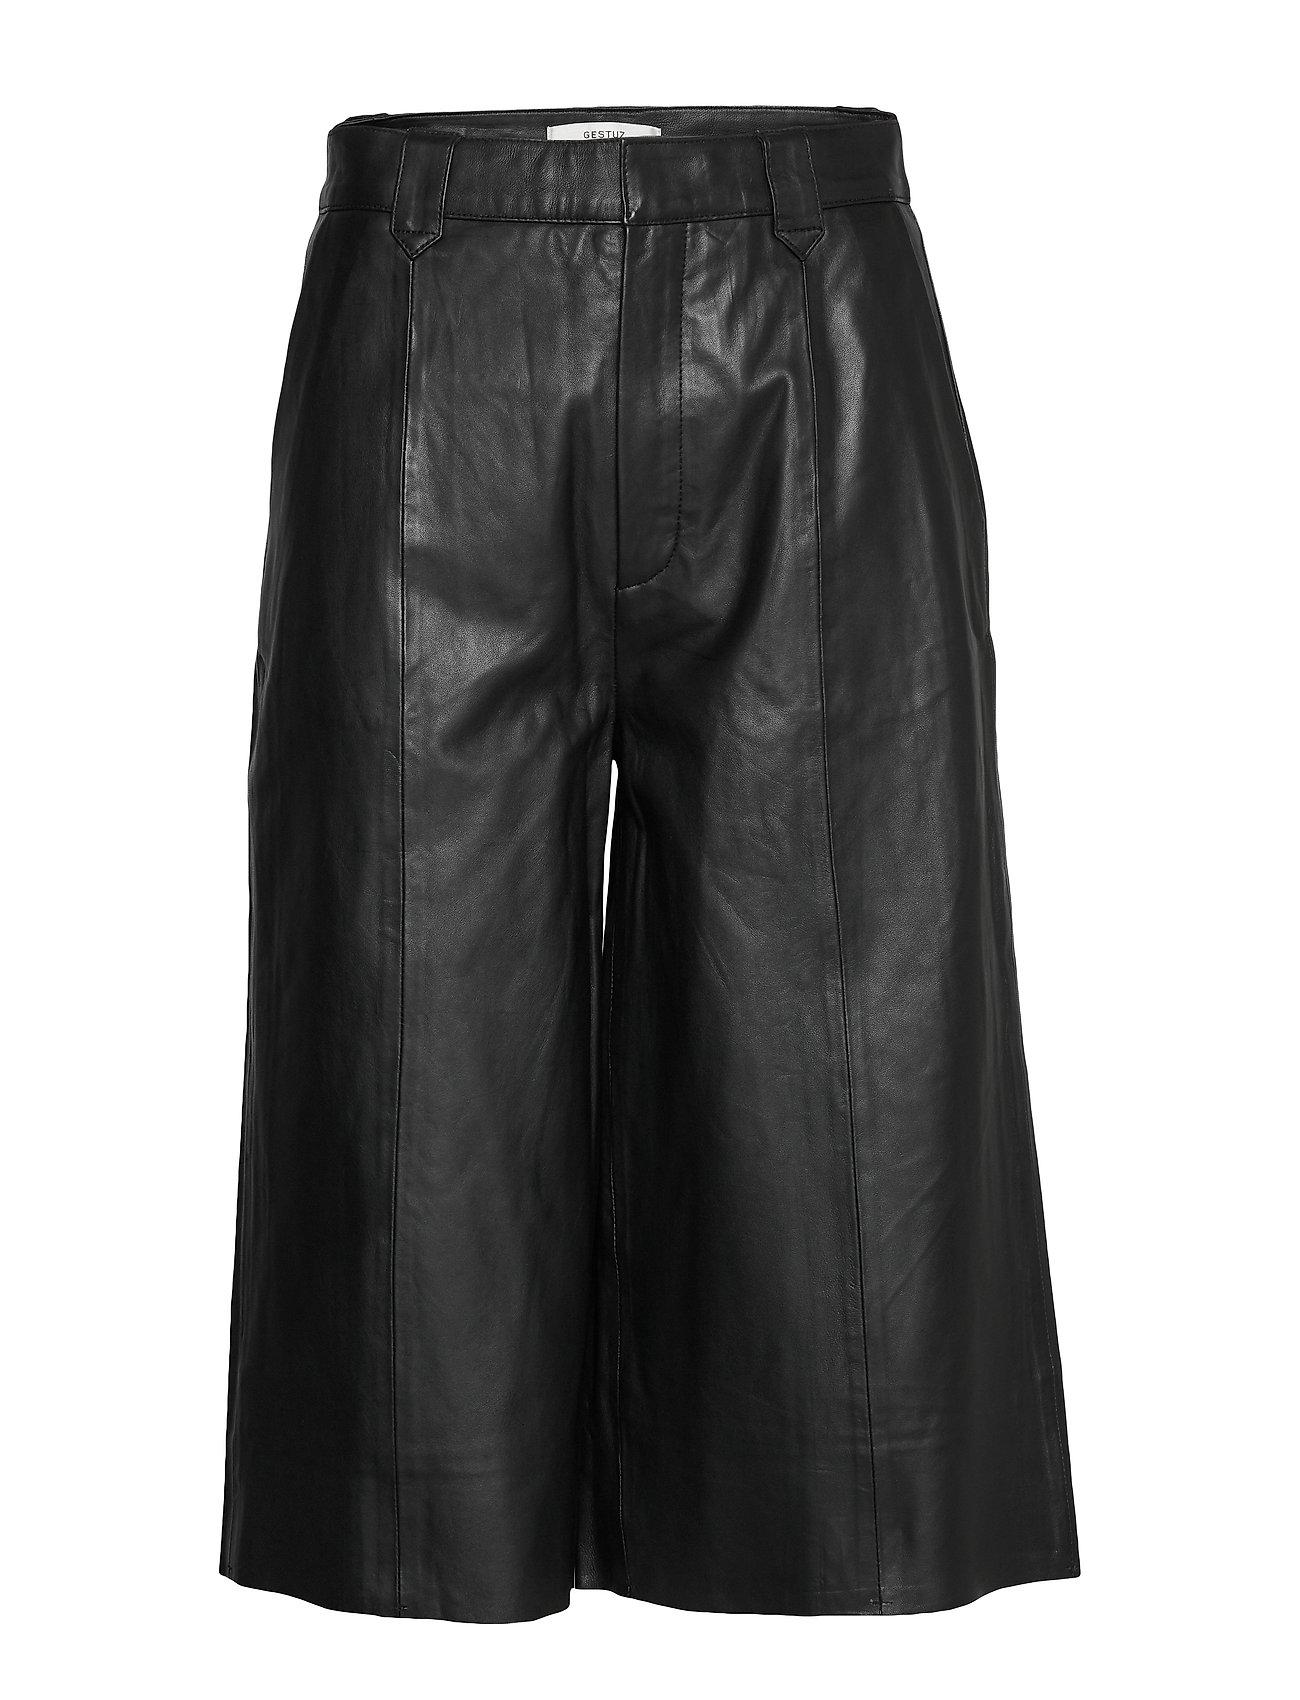 Image of Surigz Shorts Ms20 Leather Leggings/Bukser Sort Gestuz (3339884801)